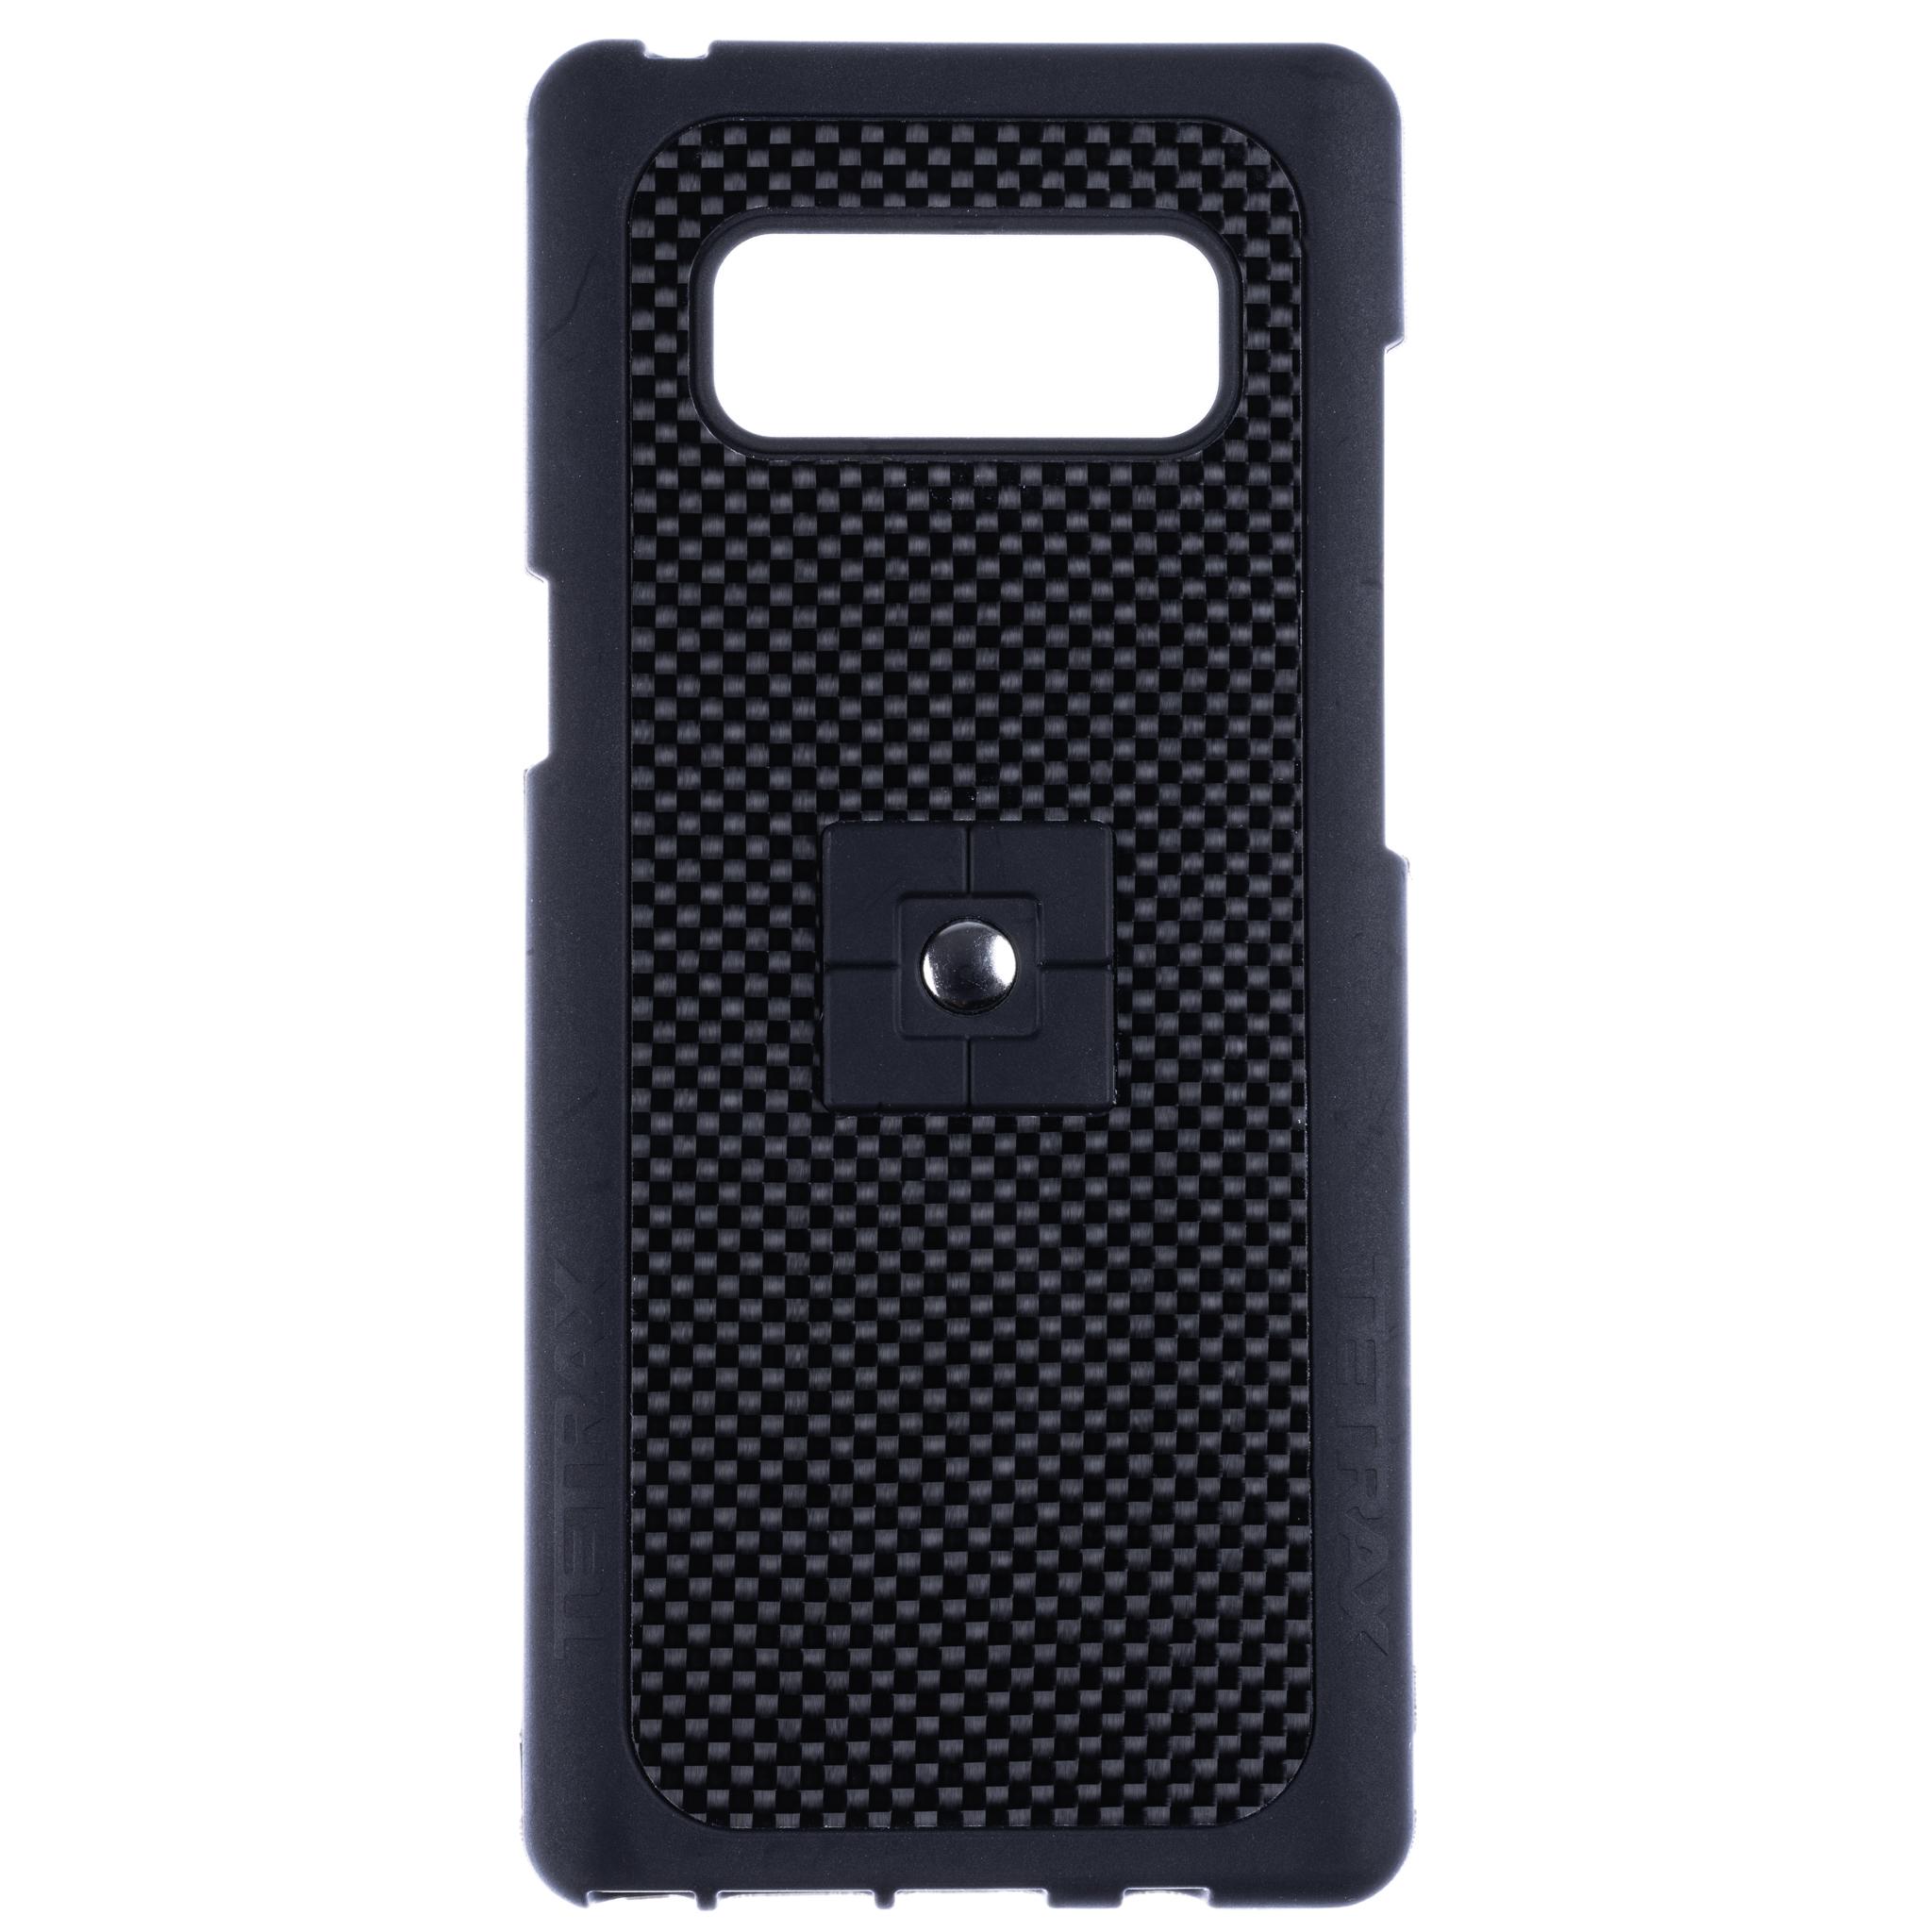 Samsung Note 8 Carbon Fibre Case with Clip